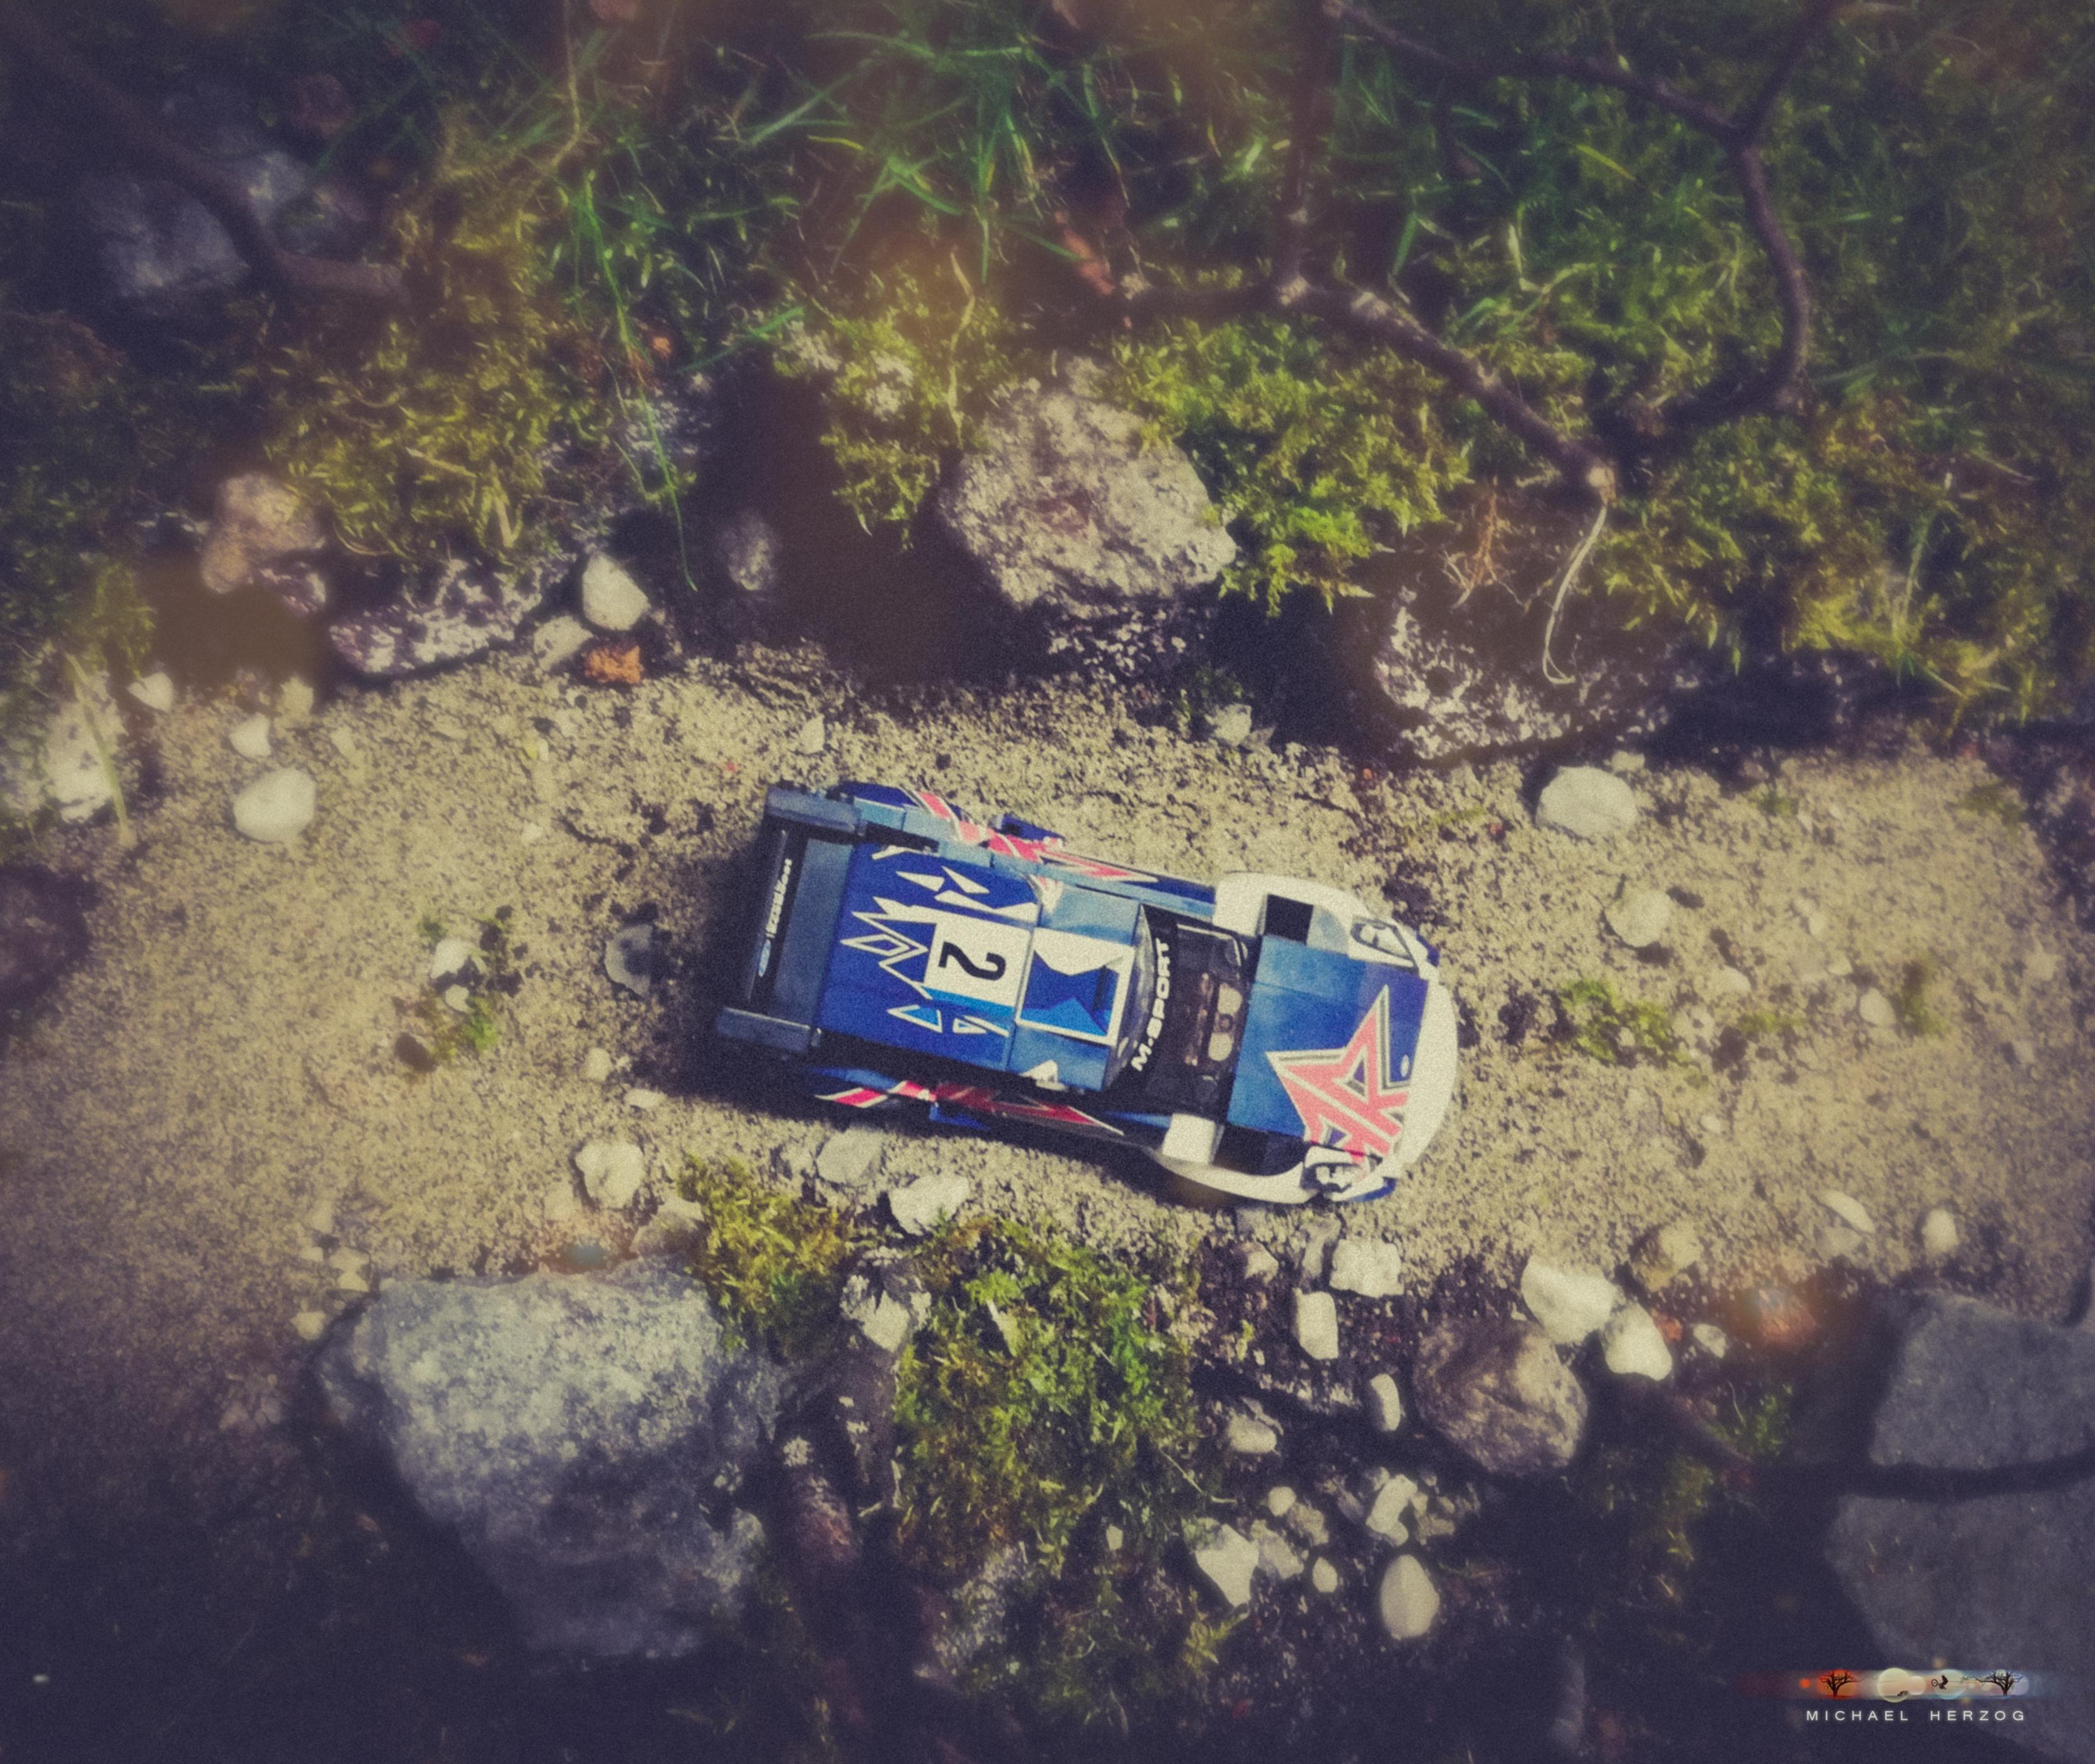 RacingRookie2019_Lego-Ford-Fiesta_Speedchampion_RookieEdition_AUTrenalinStudios-06.jpg